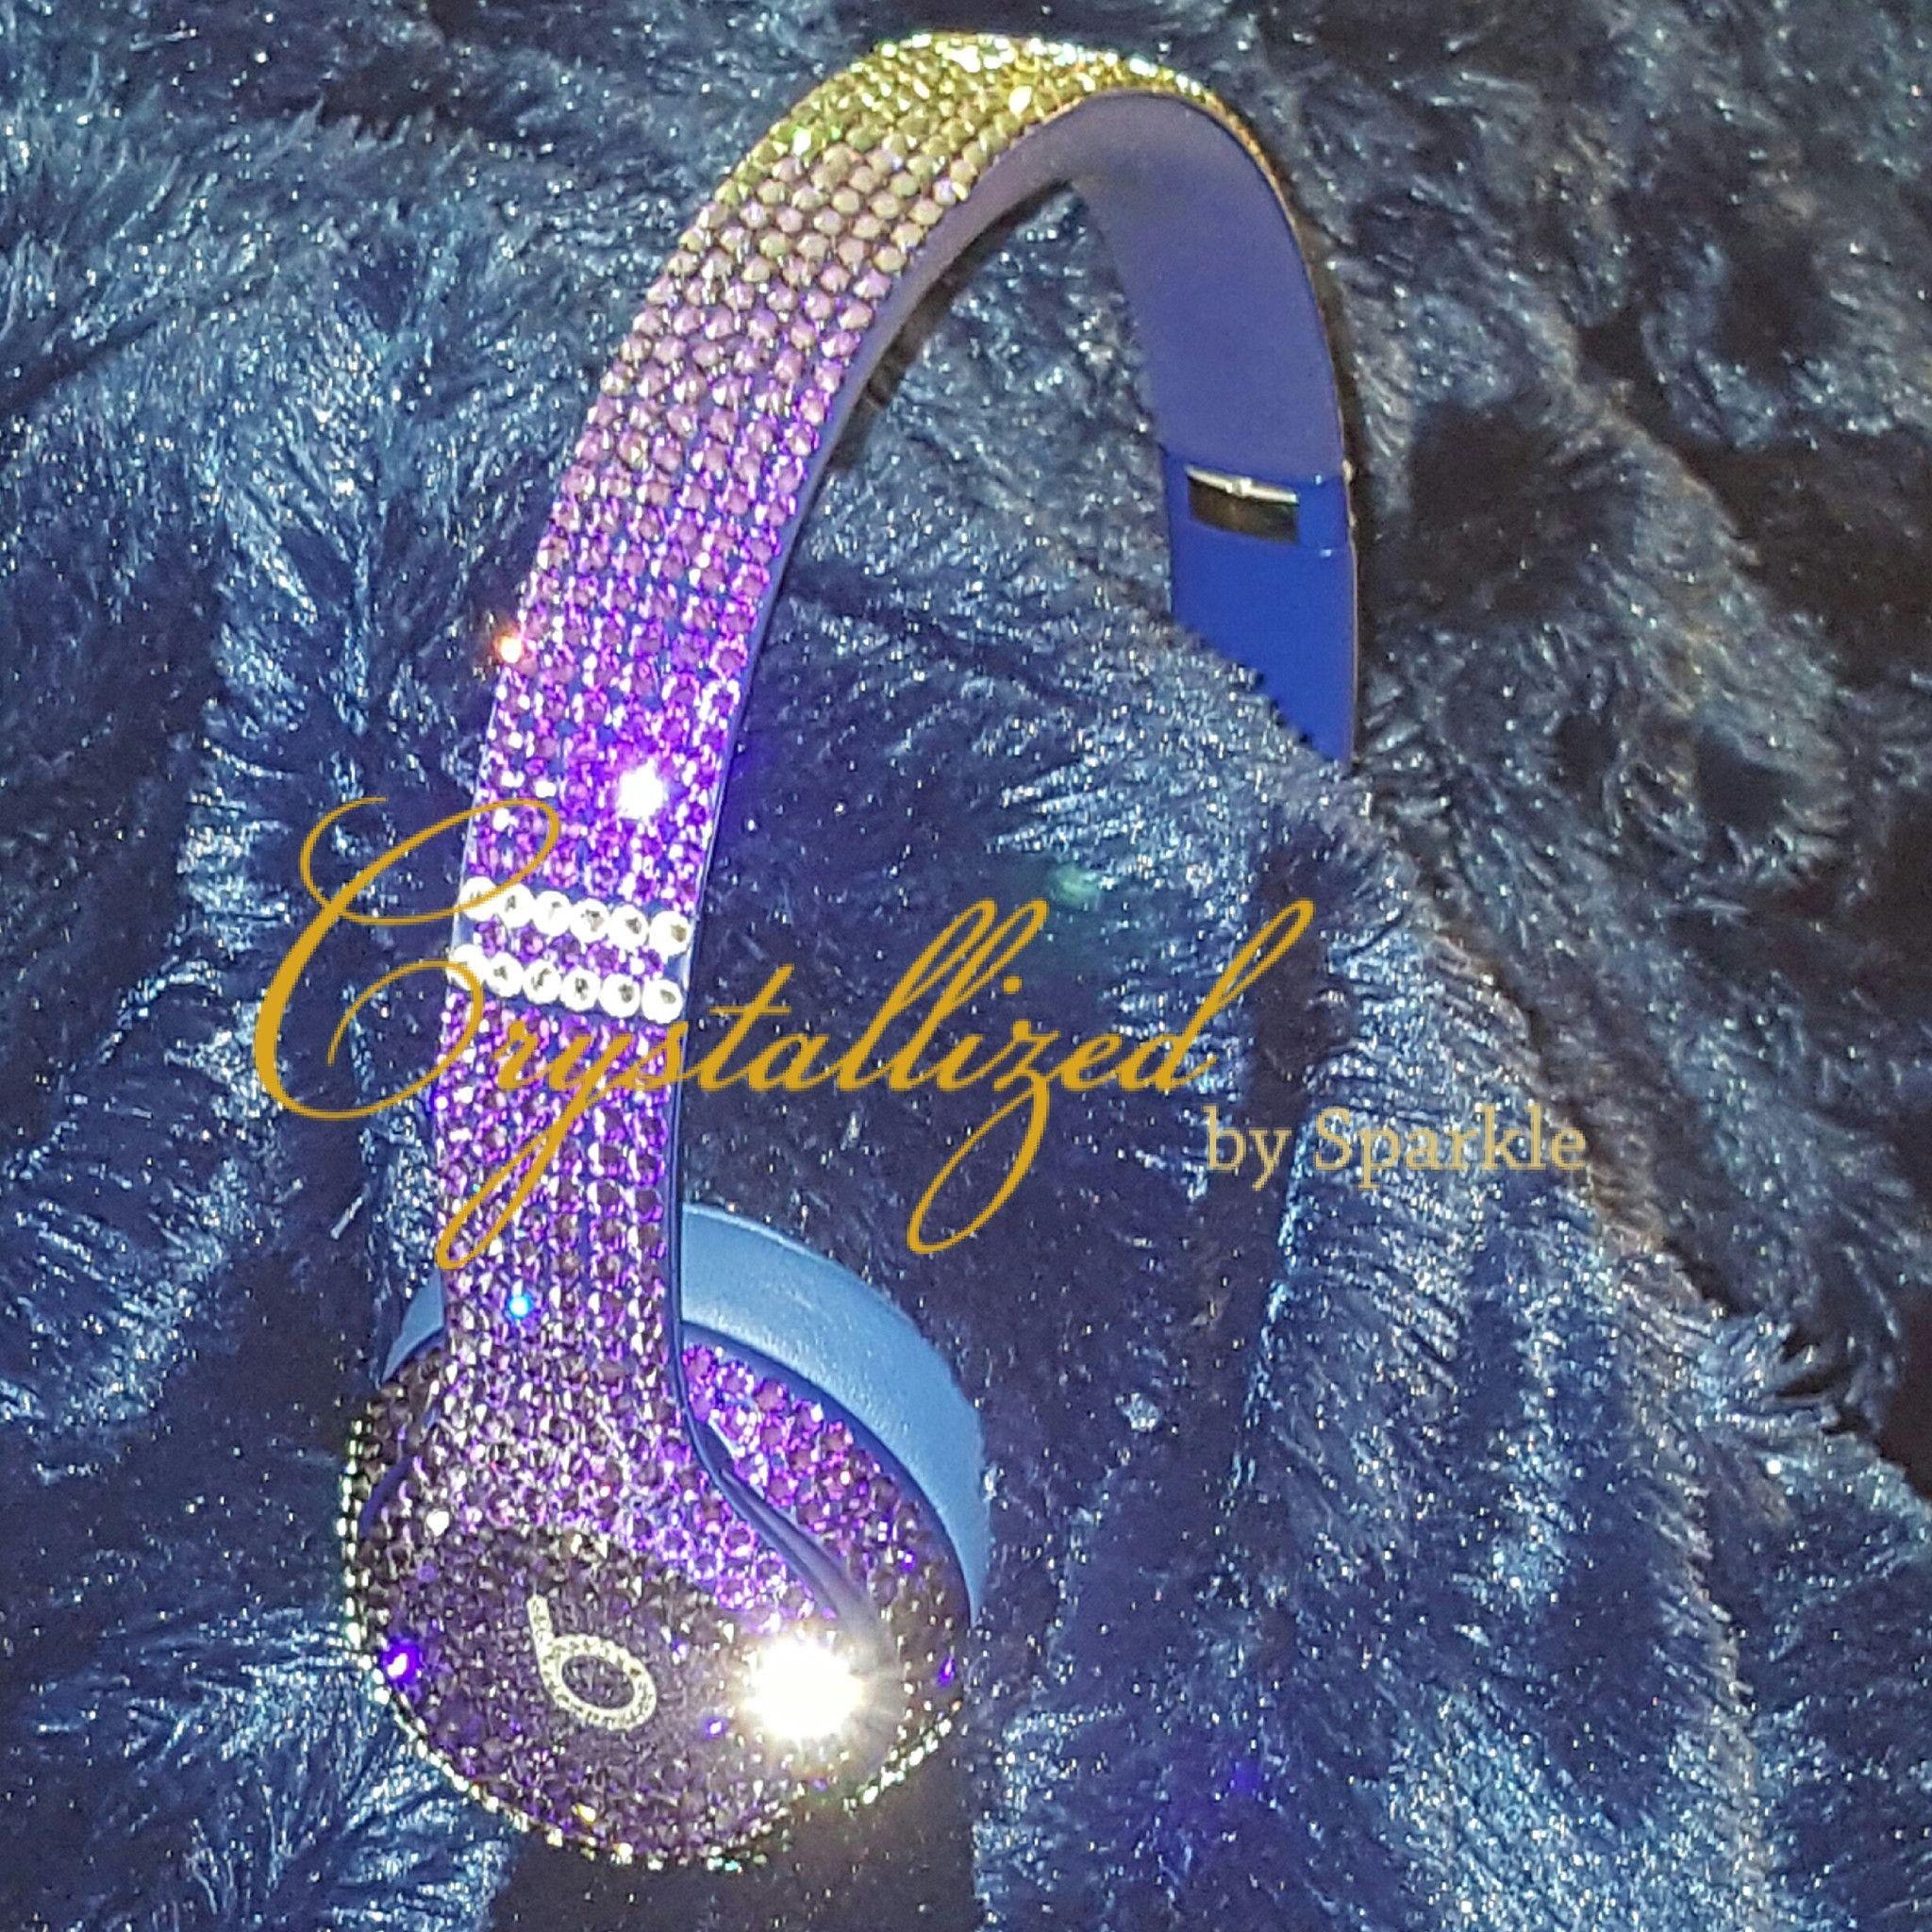 Swarovski Crystal Bling Beats by Dre Solo 2 Headphones